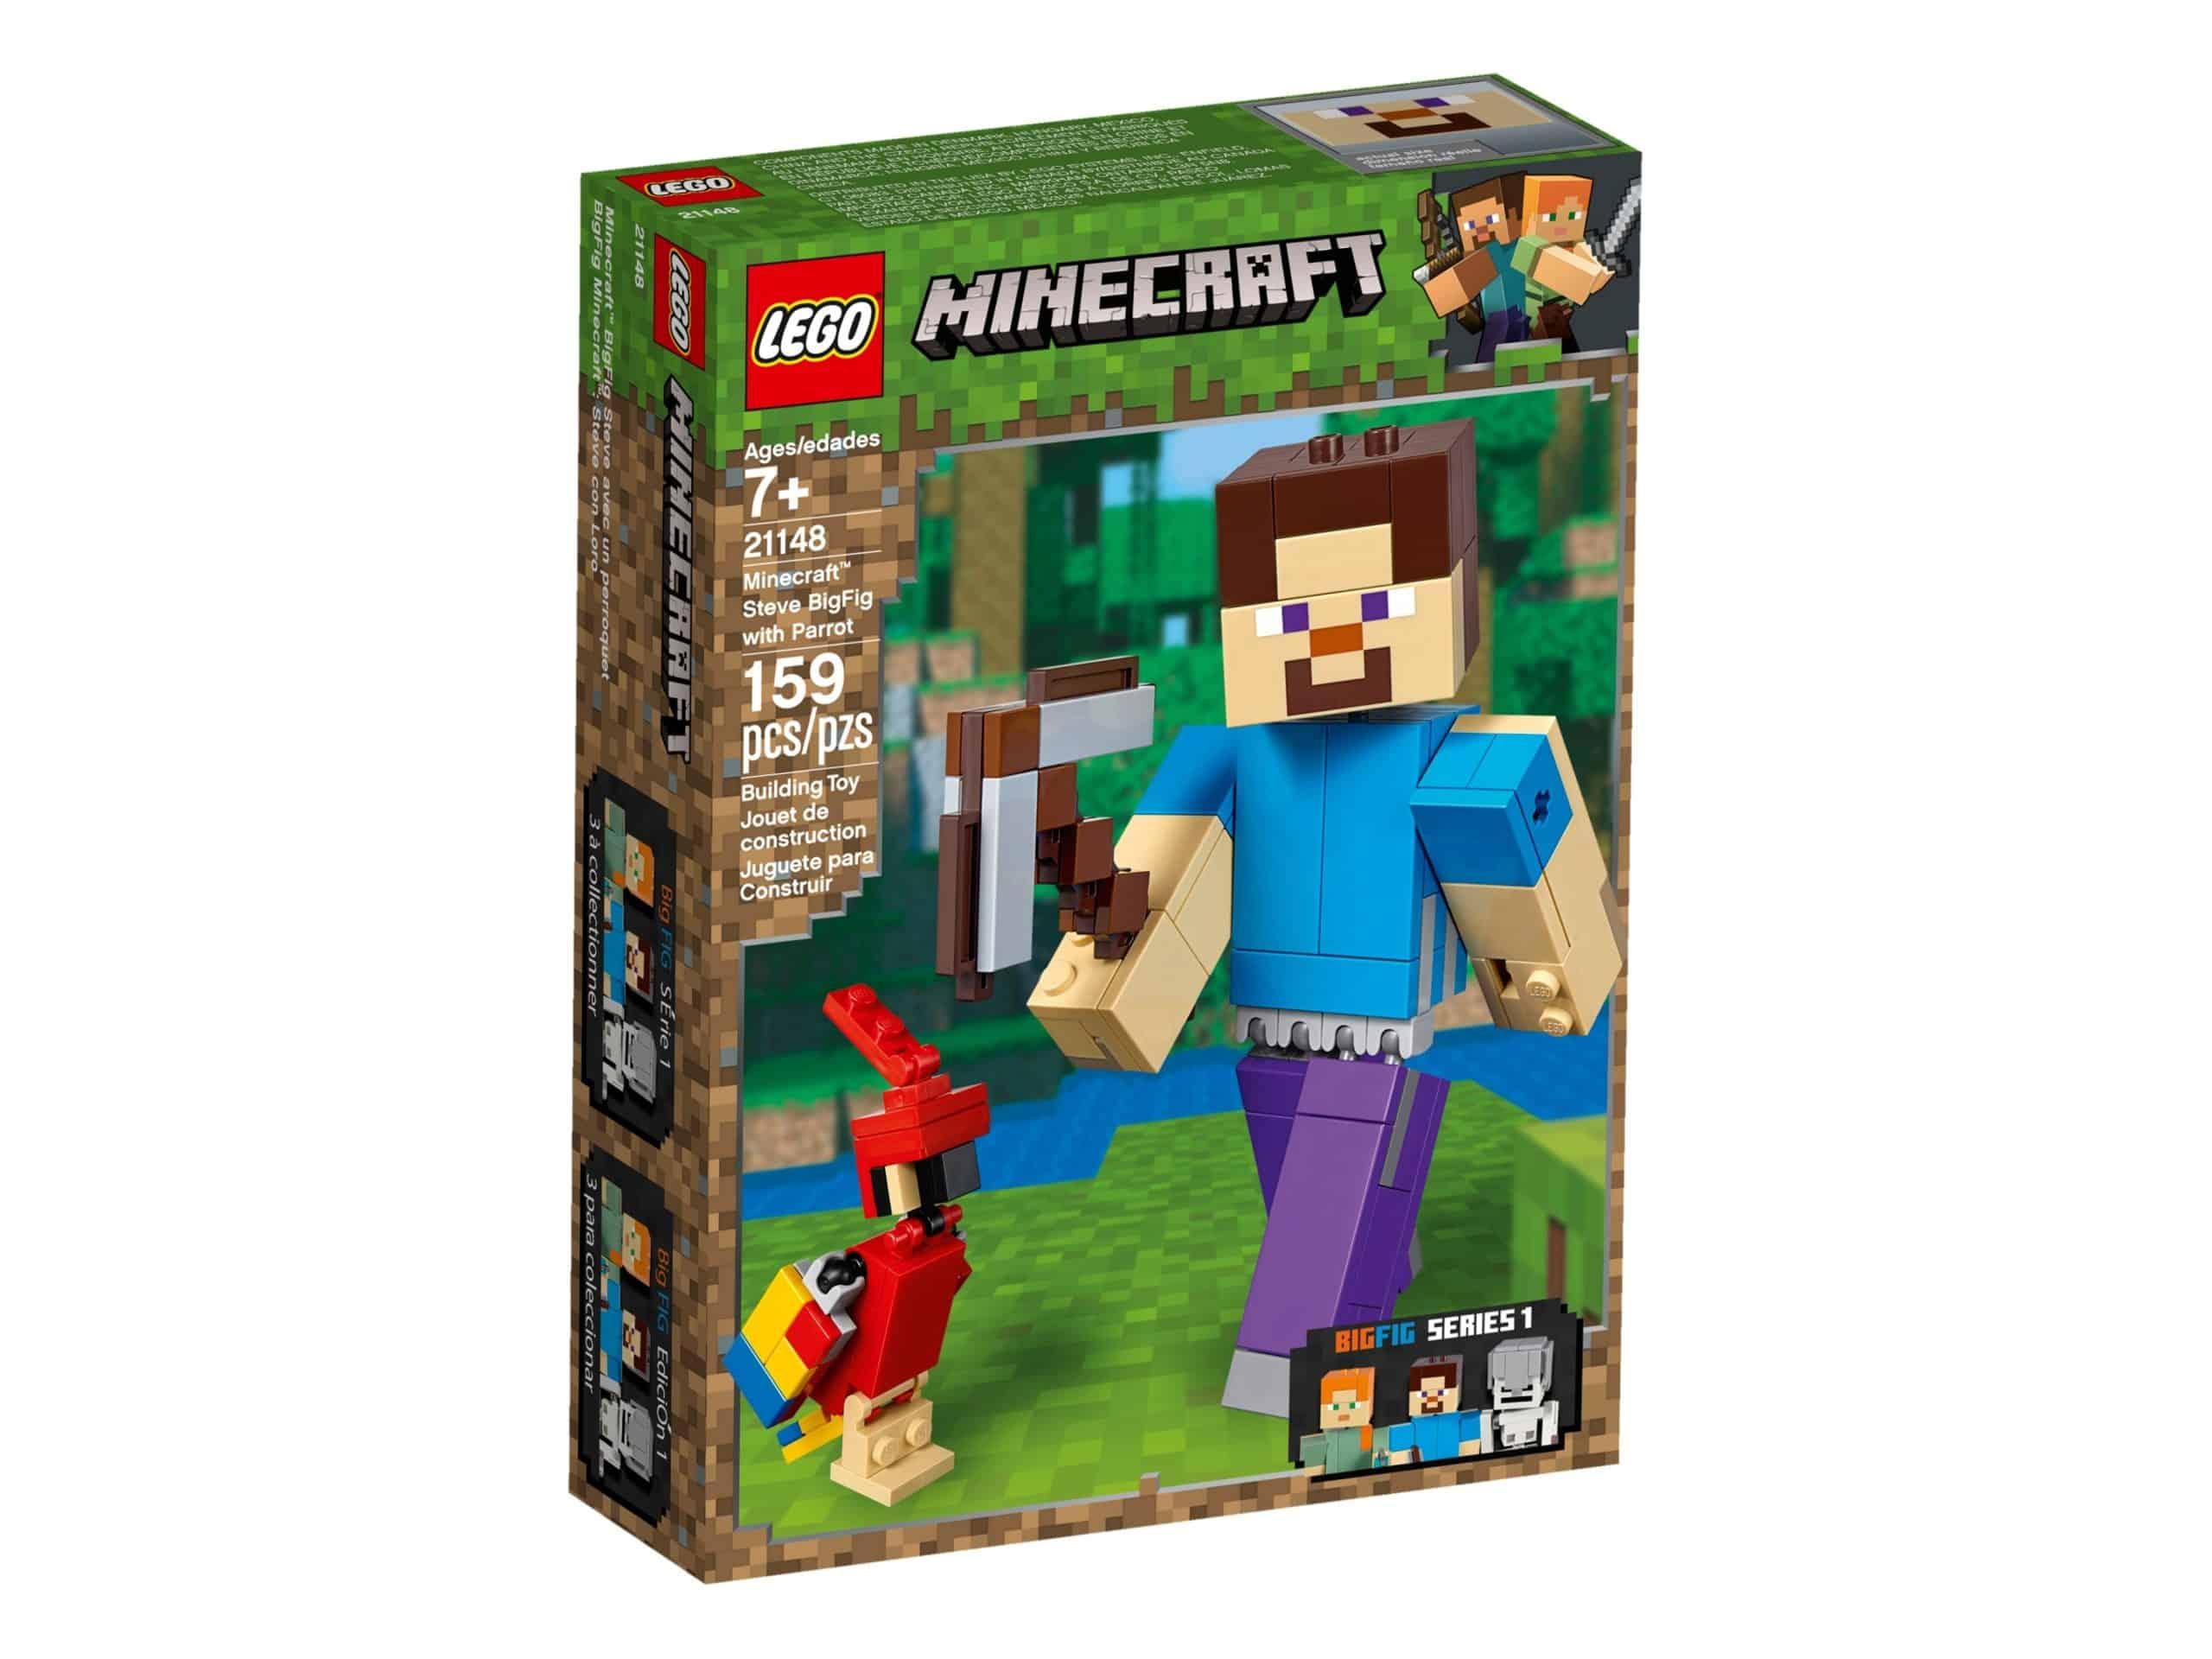 lego 21148 bigfig steve mit papagei scaled